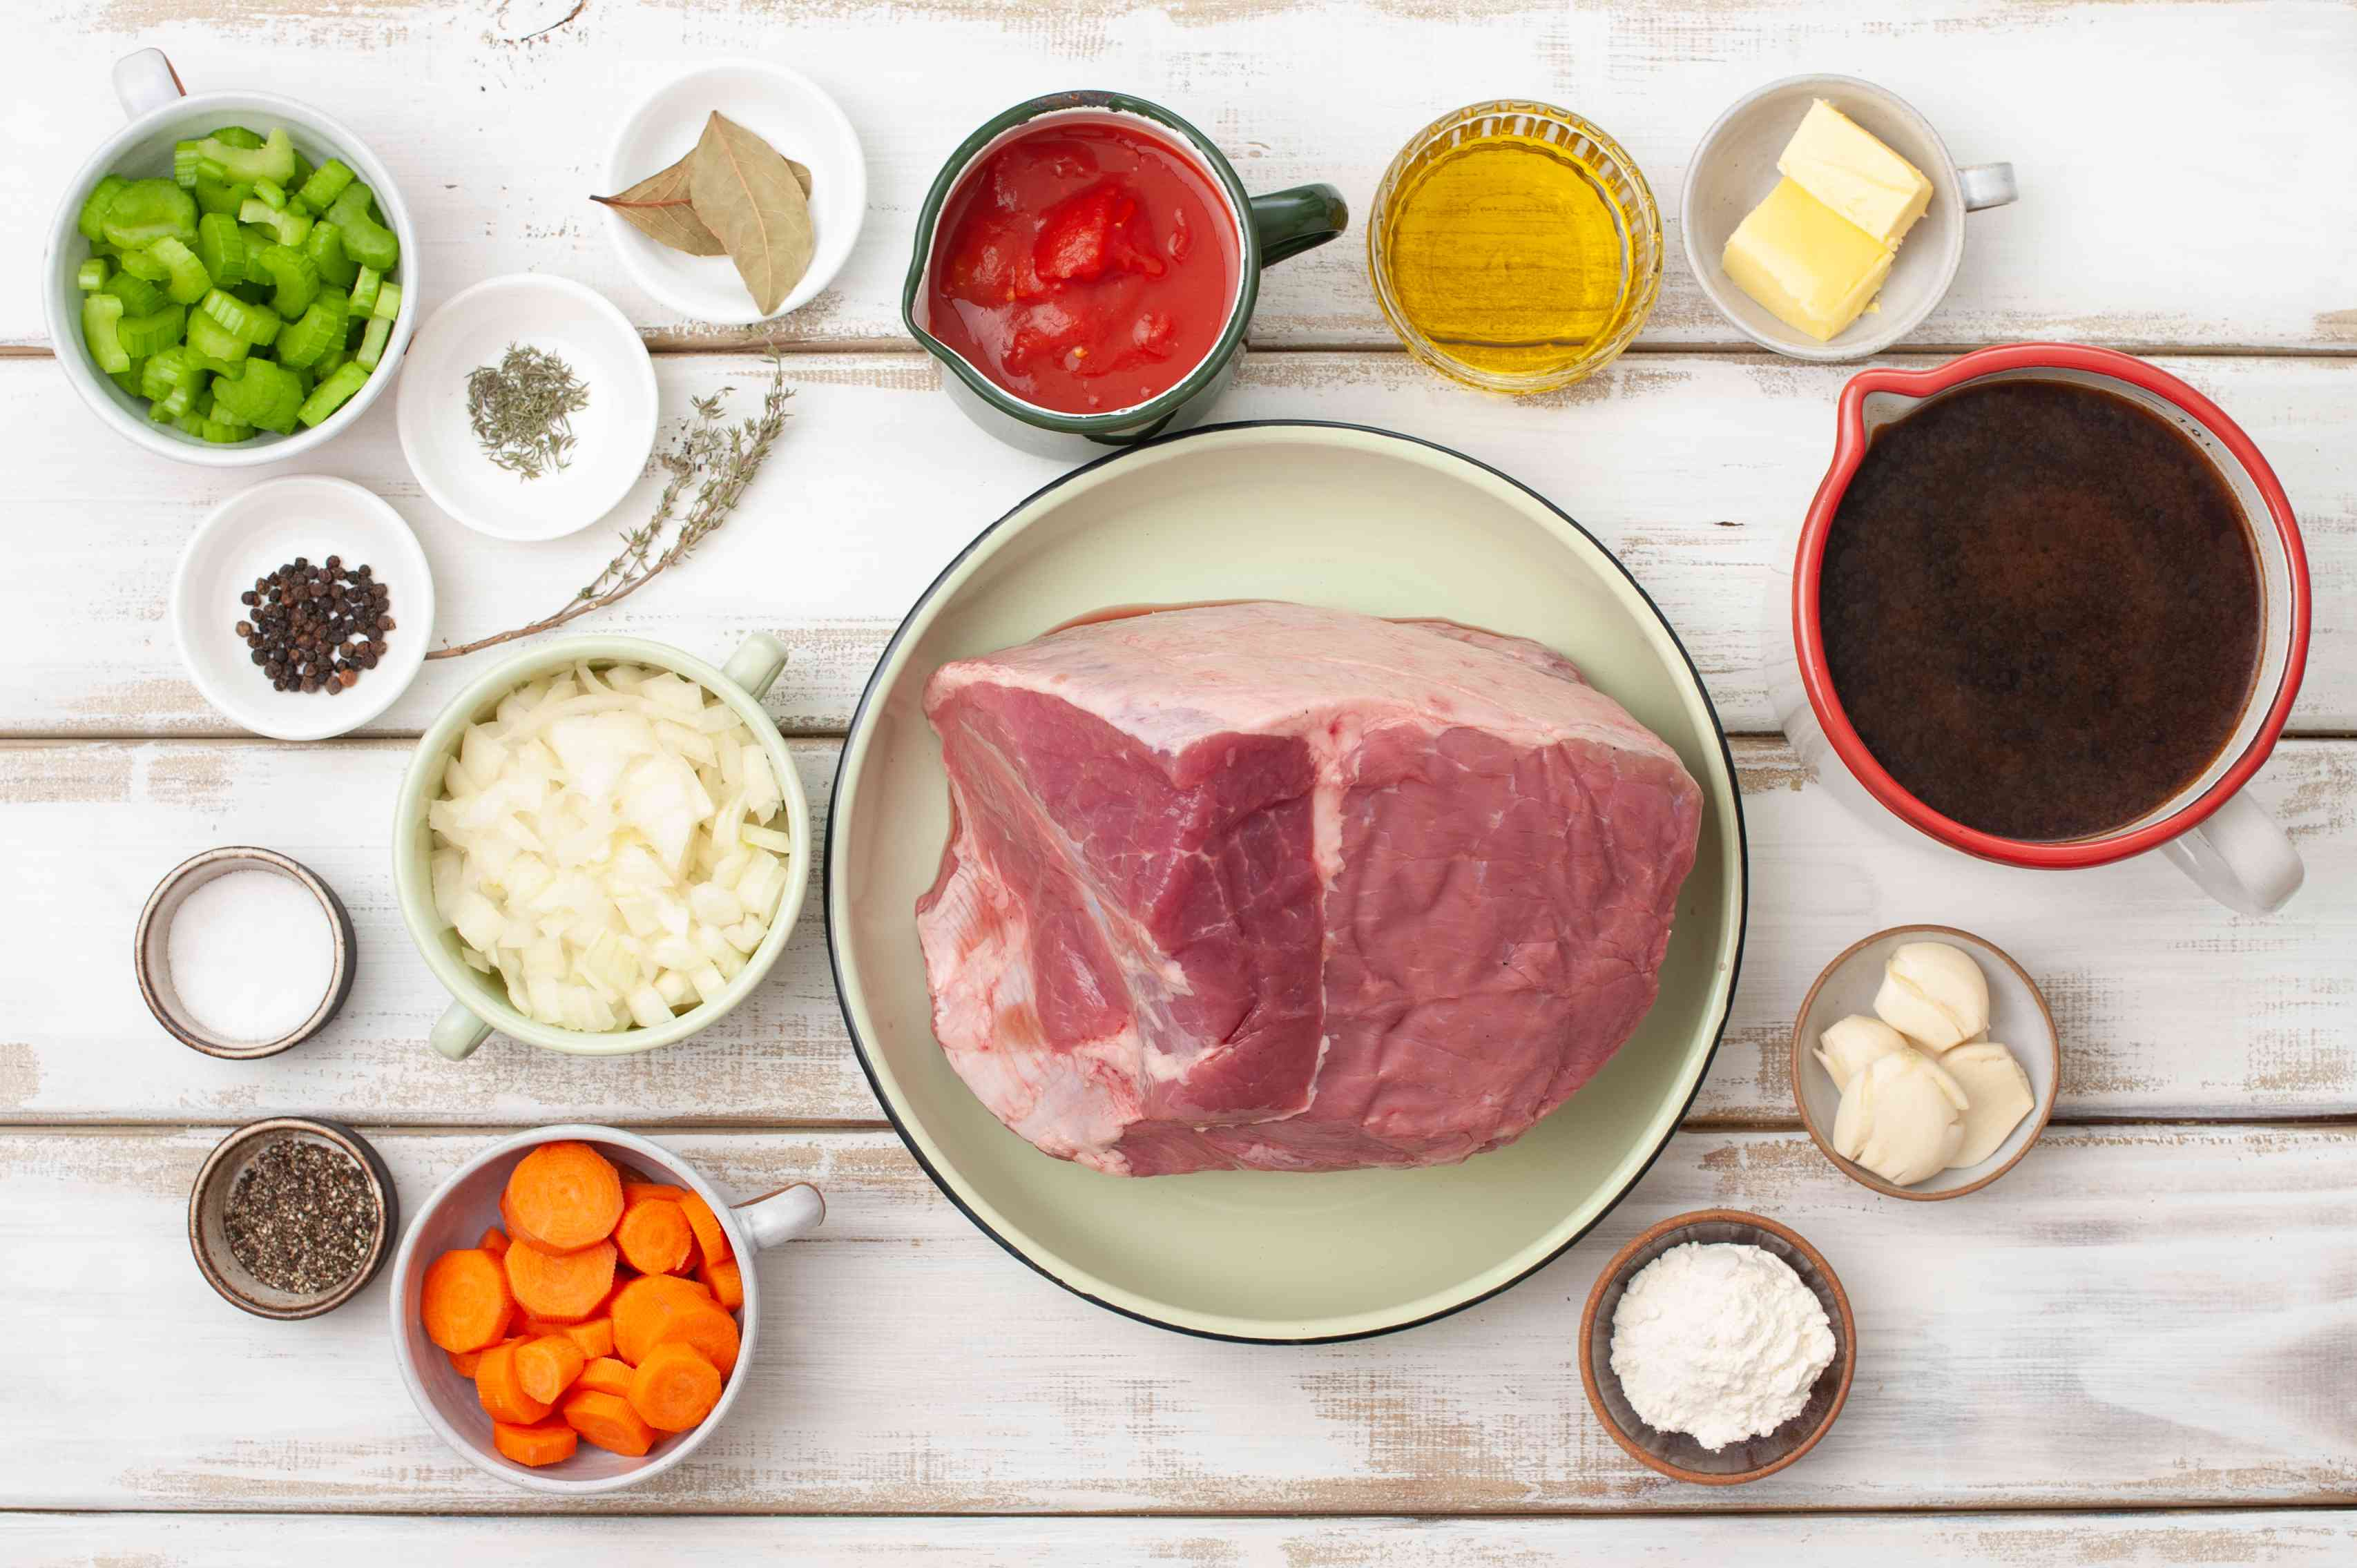 Ingredients for classic beef pot roast